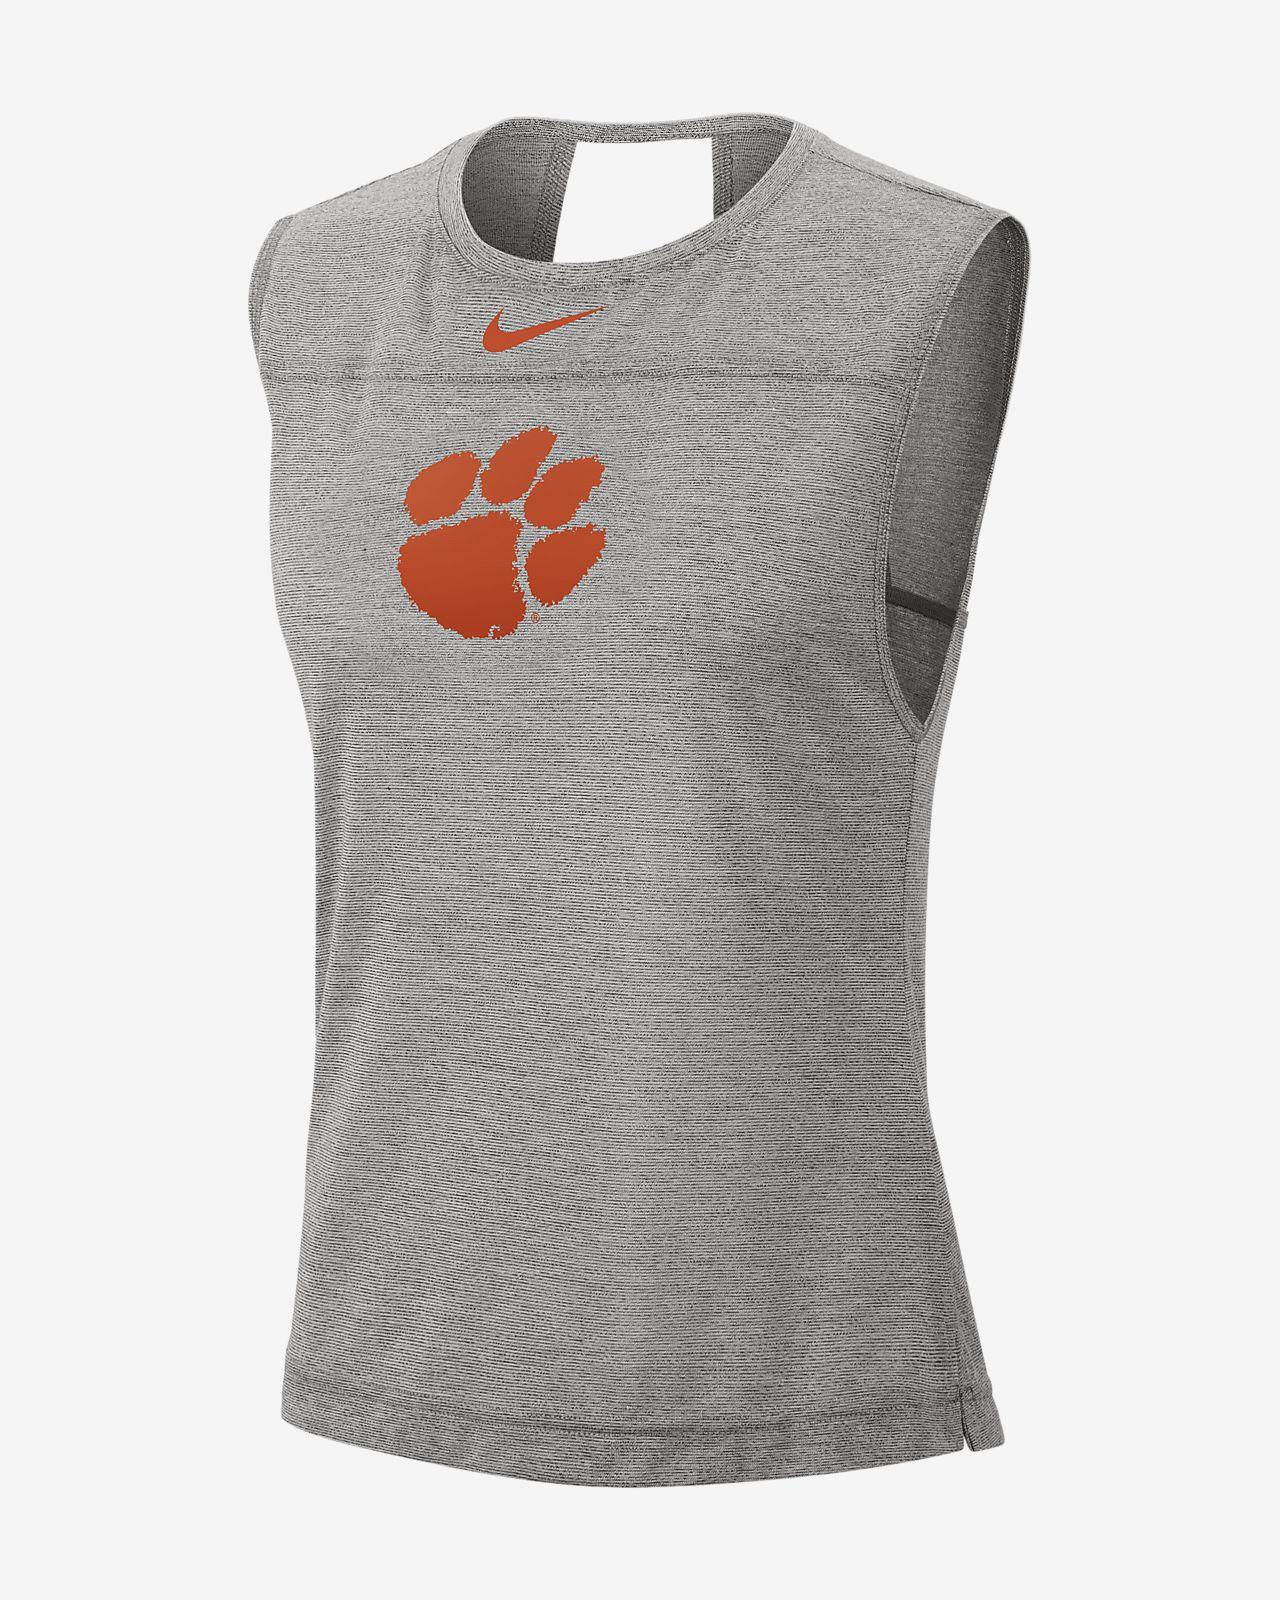 Nike College Breathe (Clemson) Women's Tank